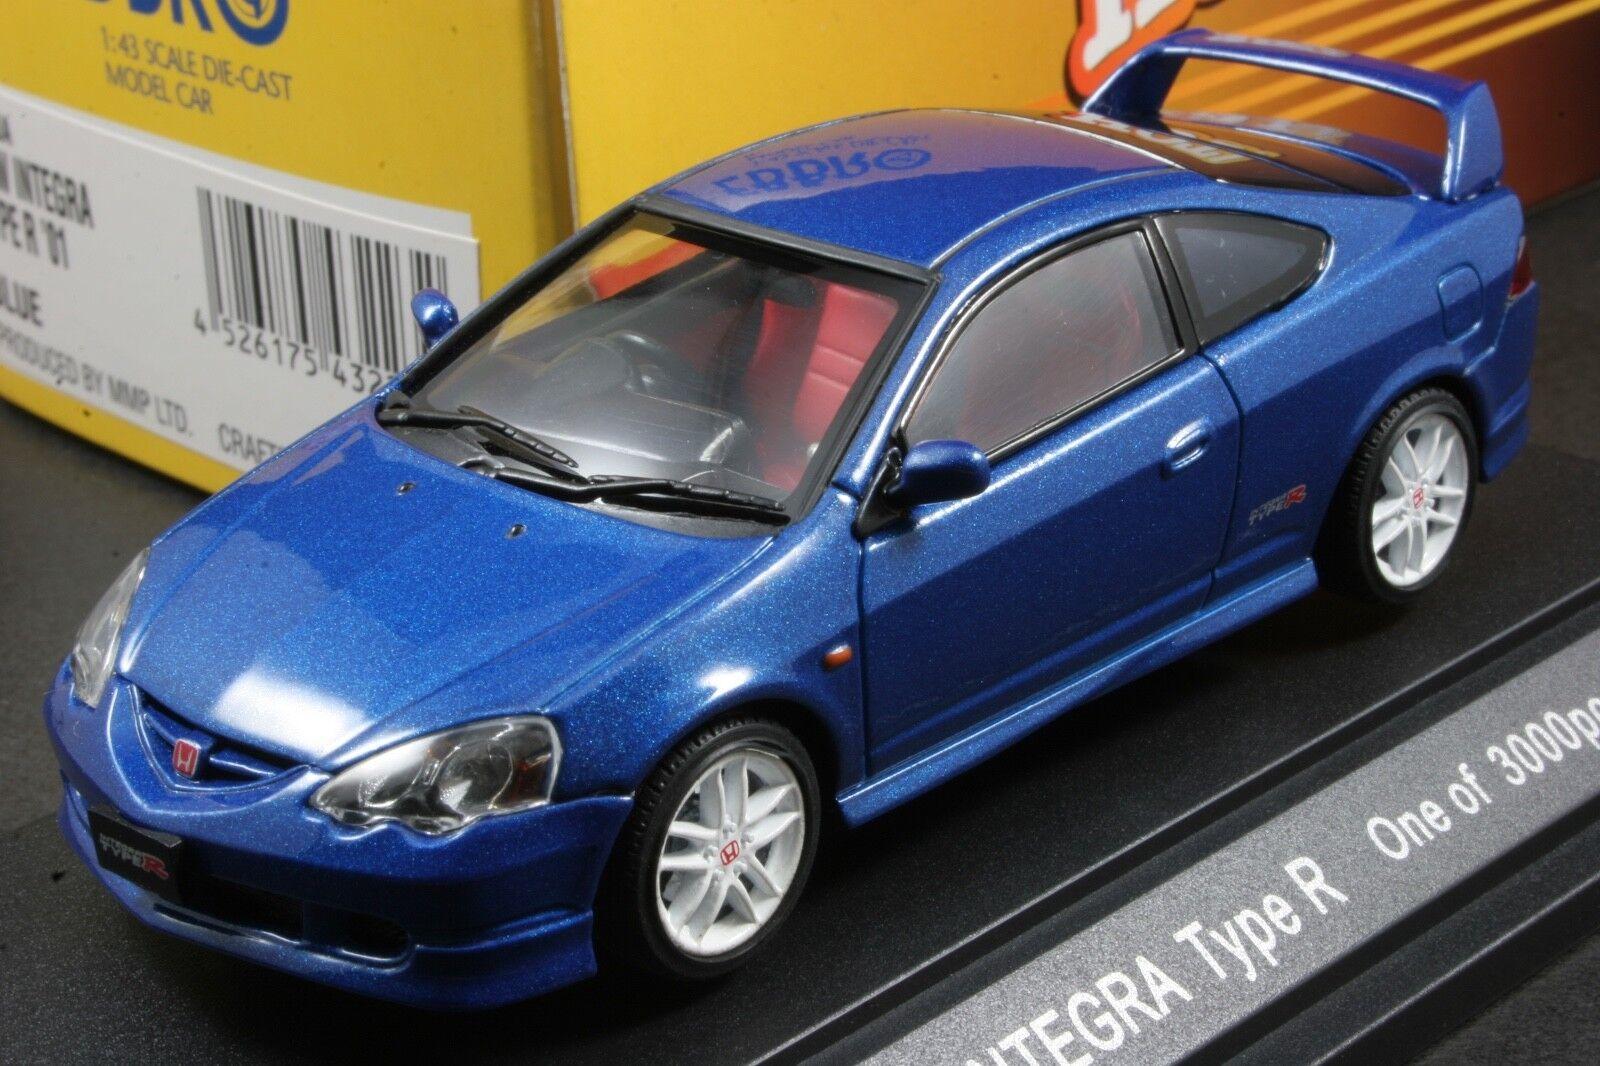 Ebbro 43223 1 43 Honda Integra Type R DC5 2001 Die Cast Model Sport Car (bluee)